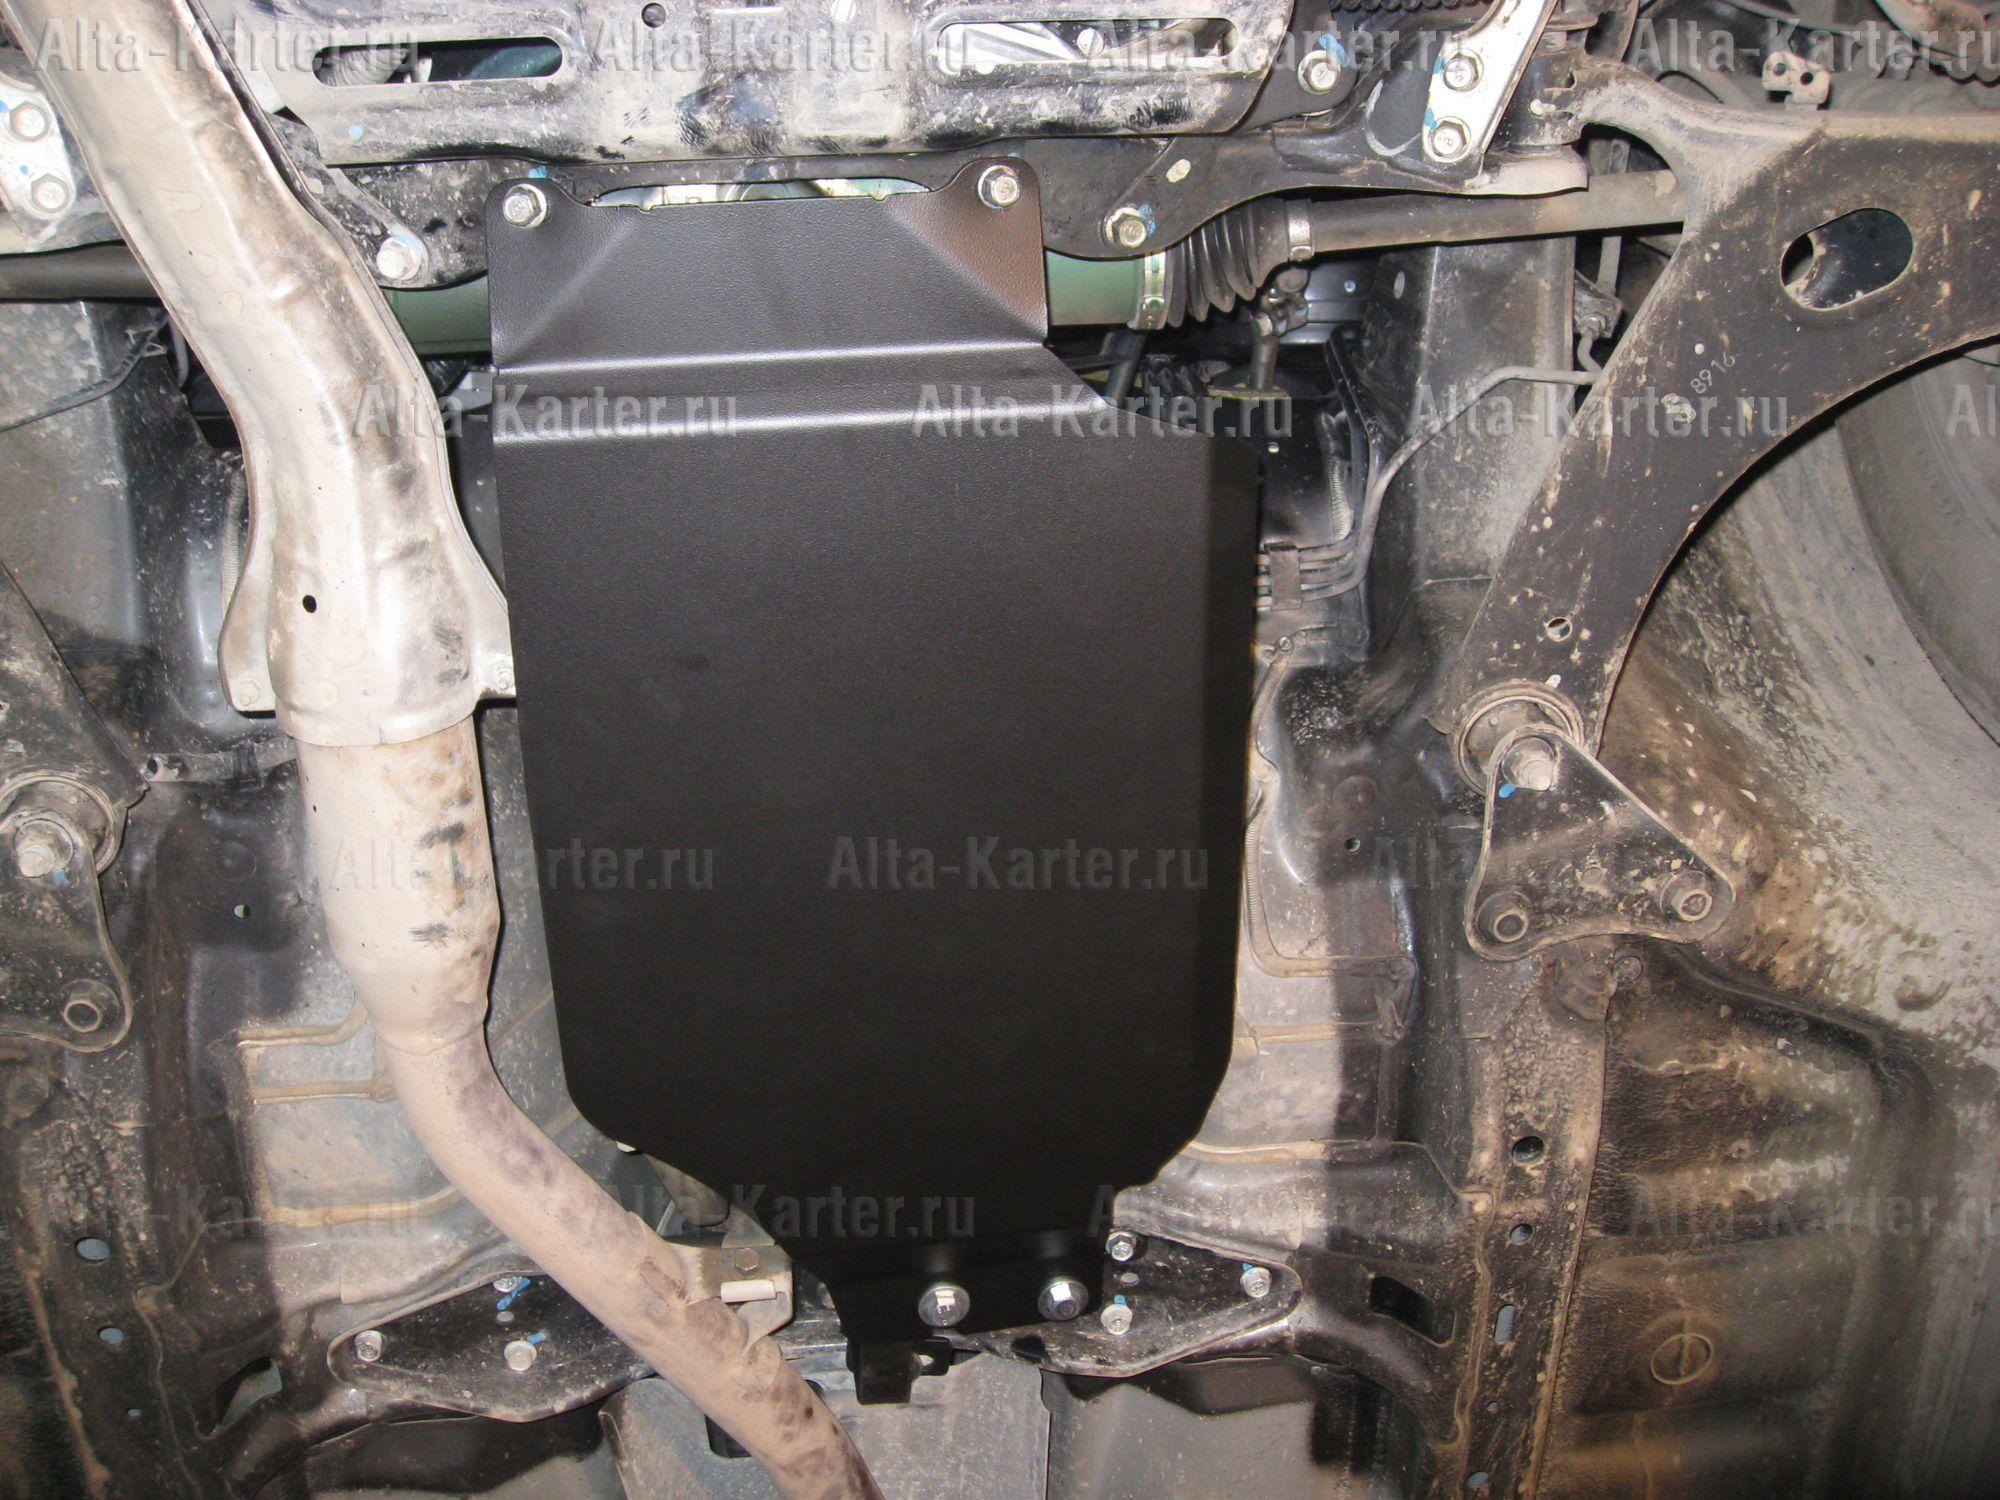 Защита Alfeco для АКПП Subaru Forester lll 2008-2012. Артикул ALF.22.24